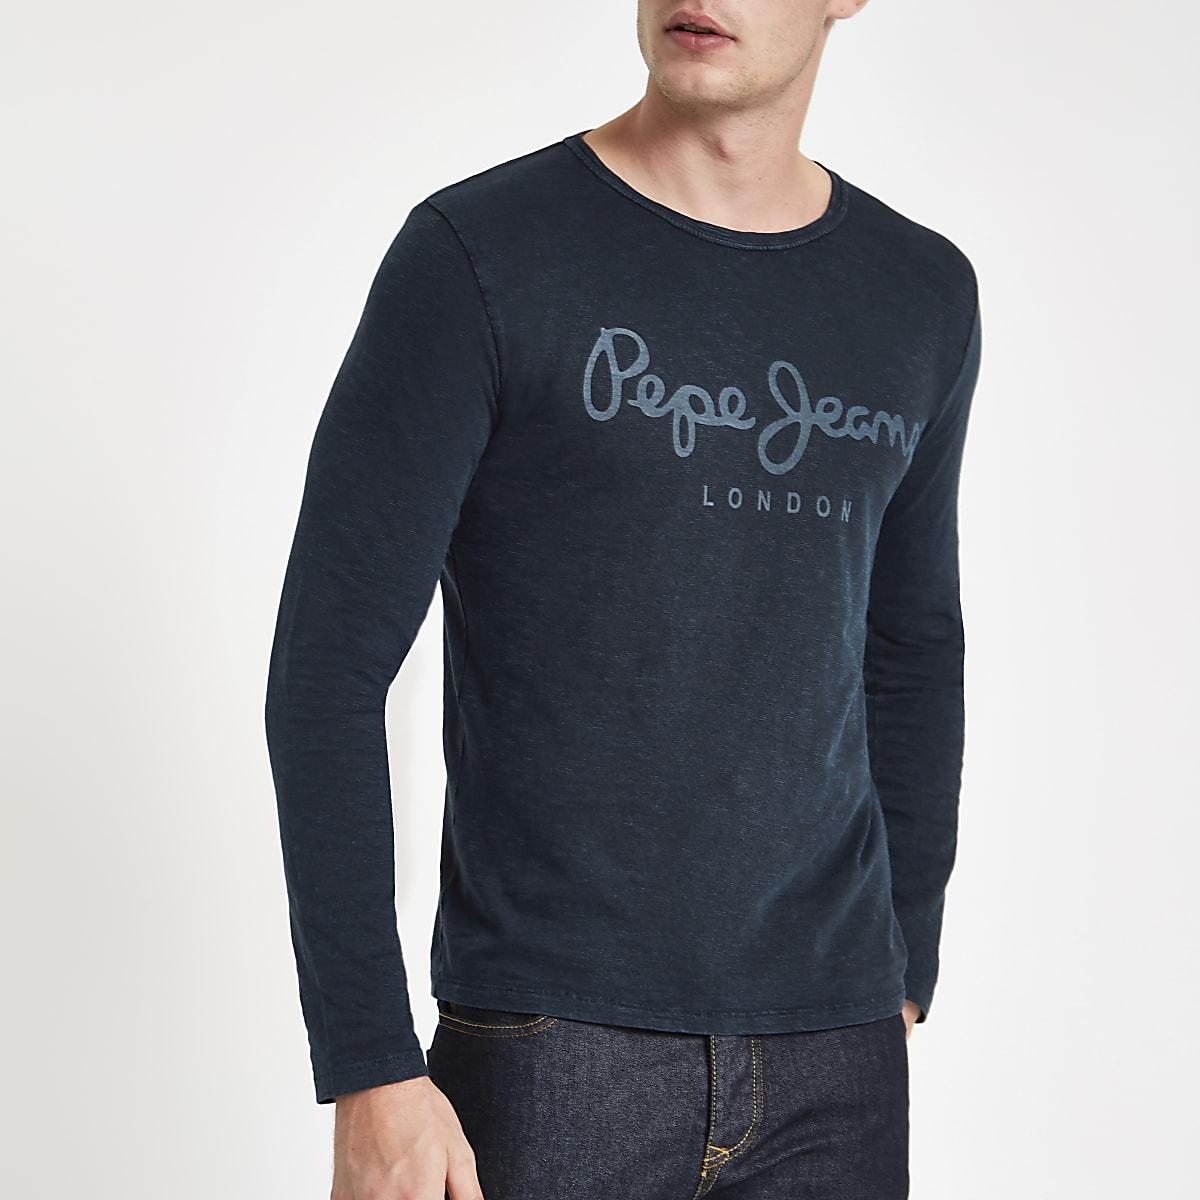 Pepe Jeans blue long sleeve T-shirt